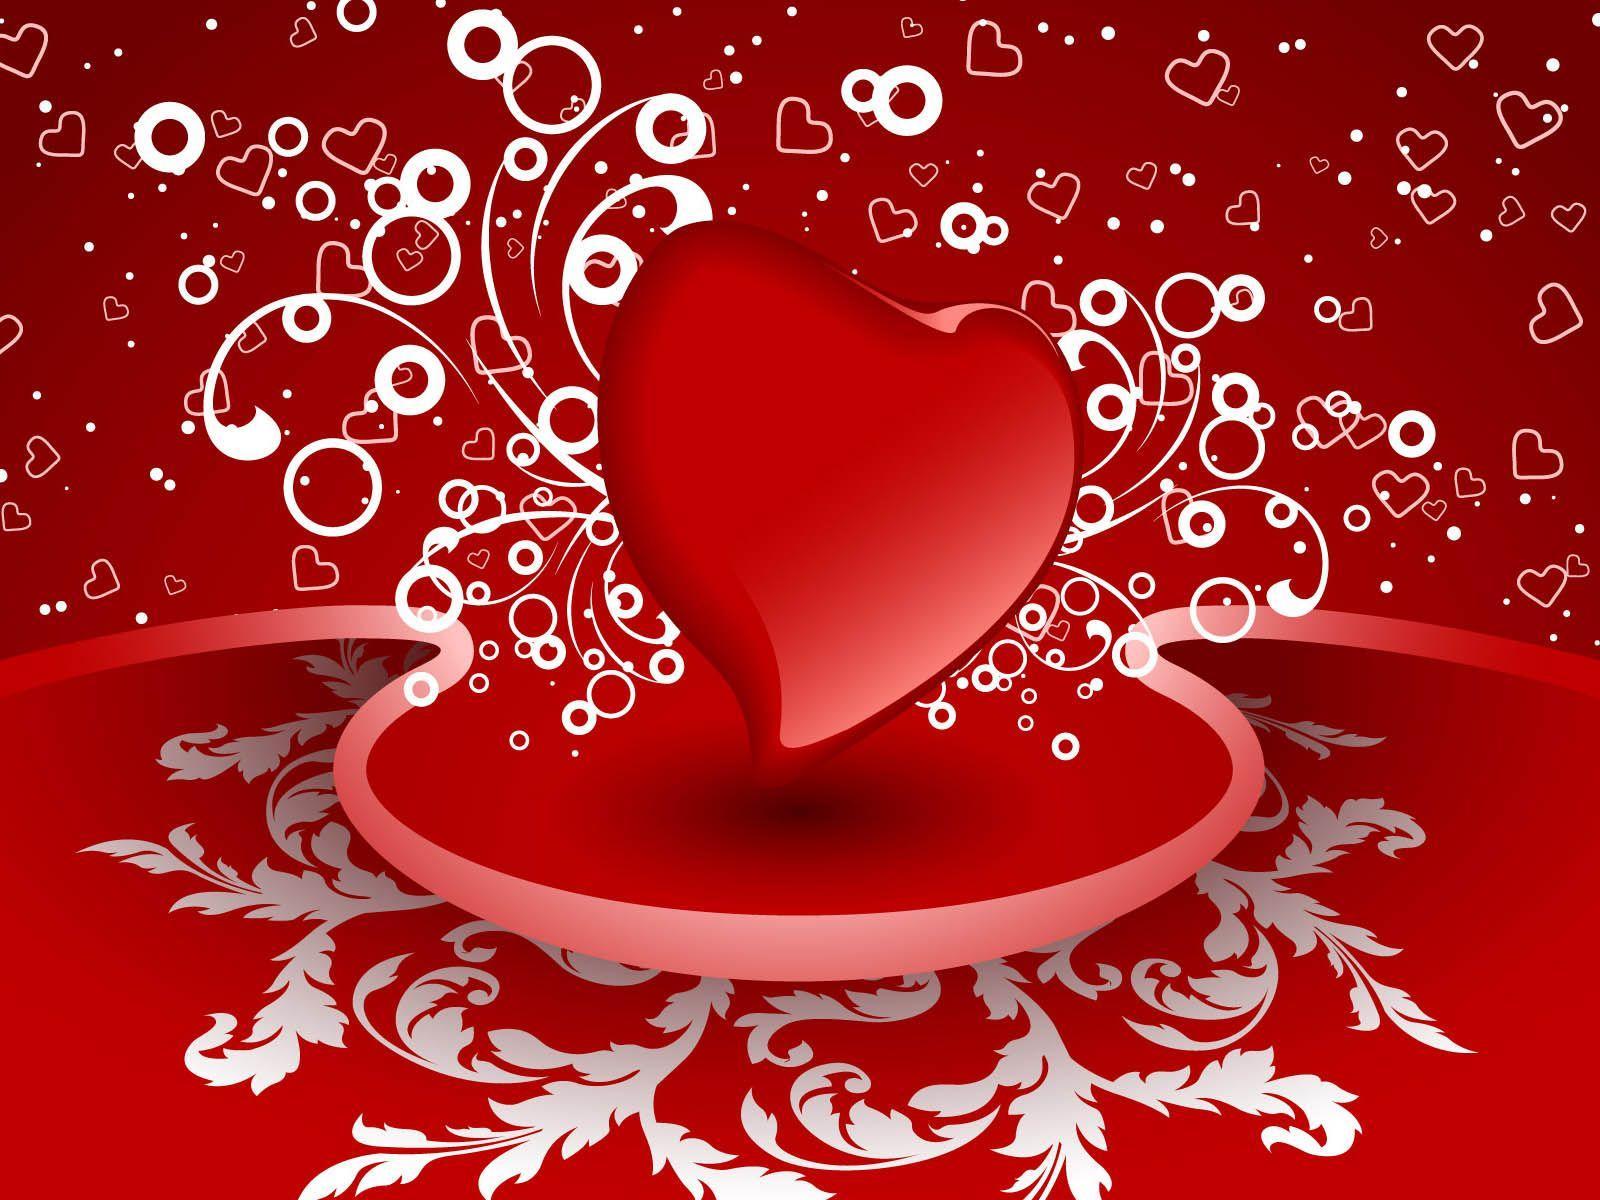 Wallpaper download love you - Love Hd Wallpapers Free Desk Wallpapers